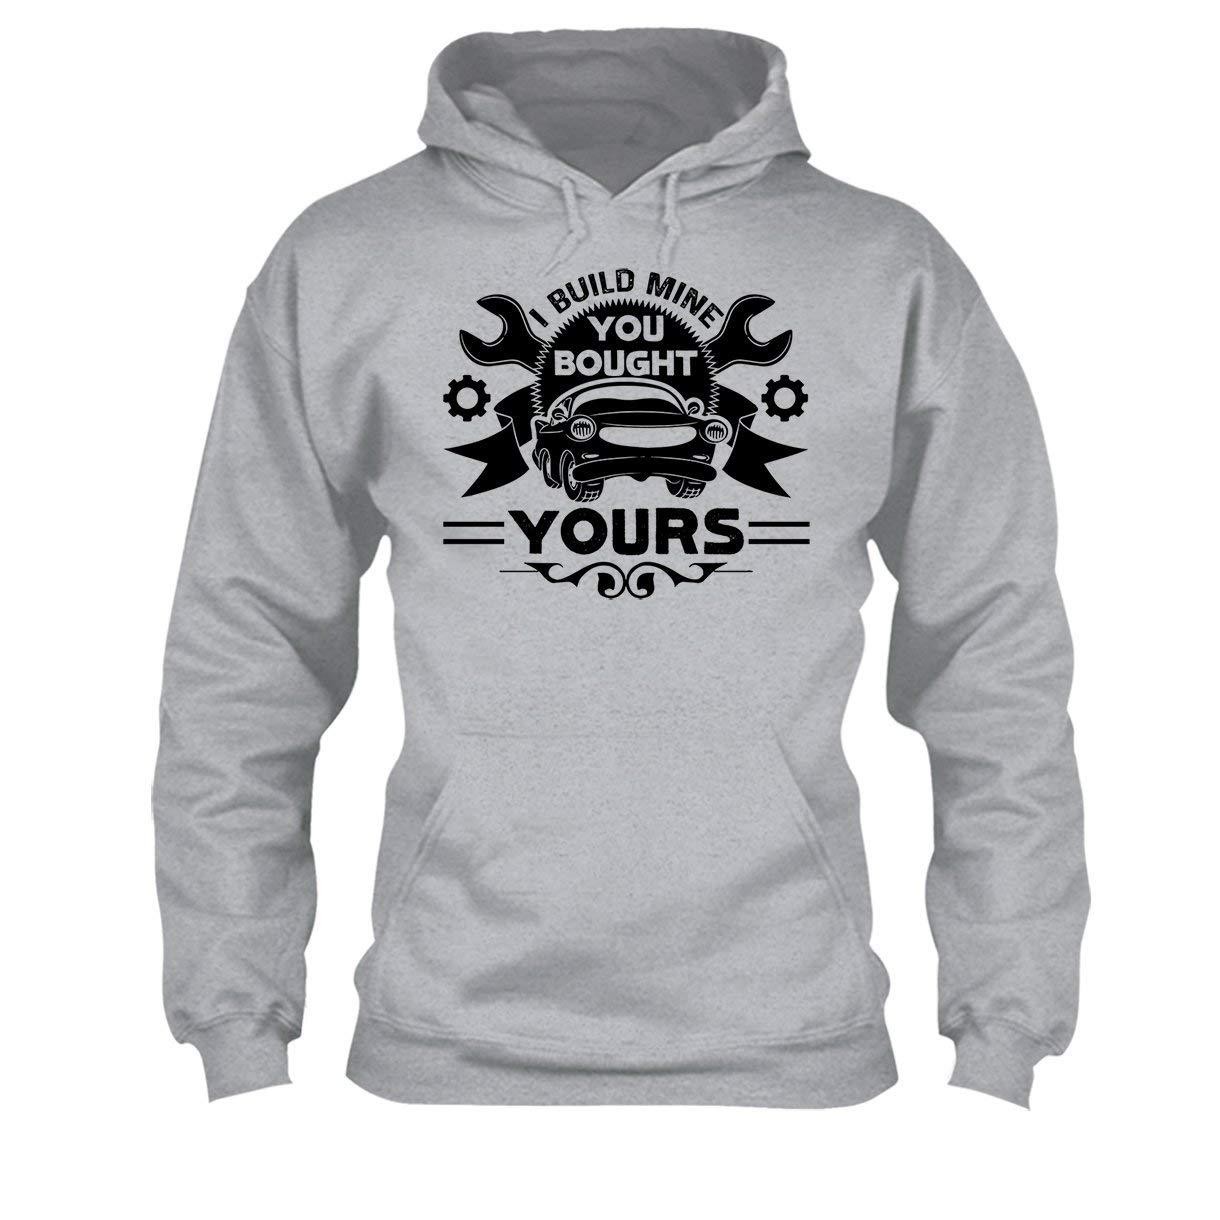 Hoodie Car Mechanic Sweatshirt I Build Mine You Bought Yours Tee Shirt